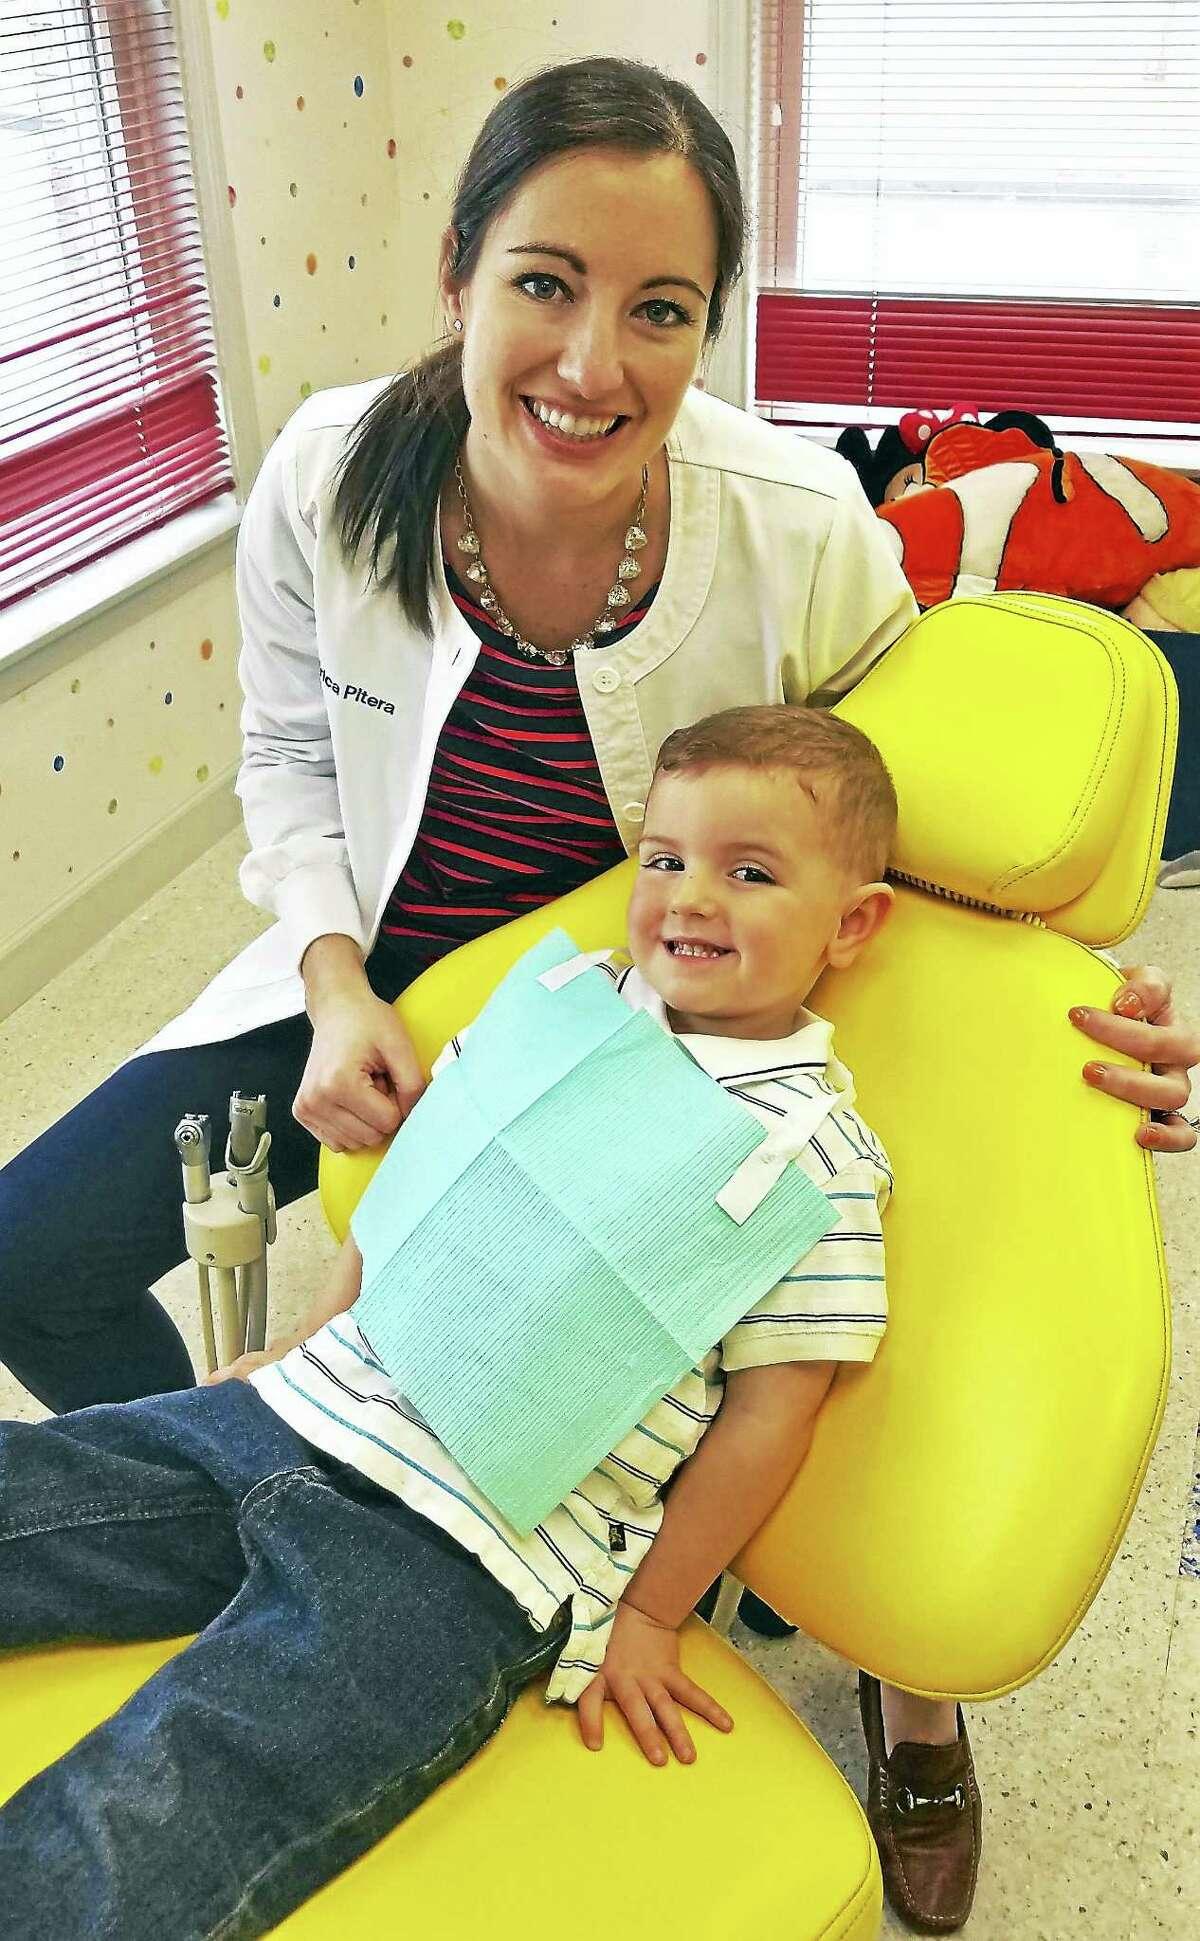 Pediatric dentist Erica Pitera with Jacob Pavia, of Middletown.